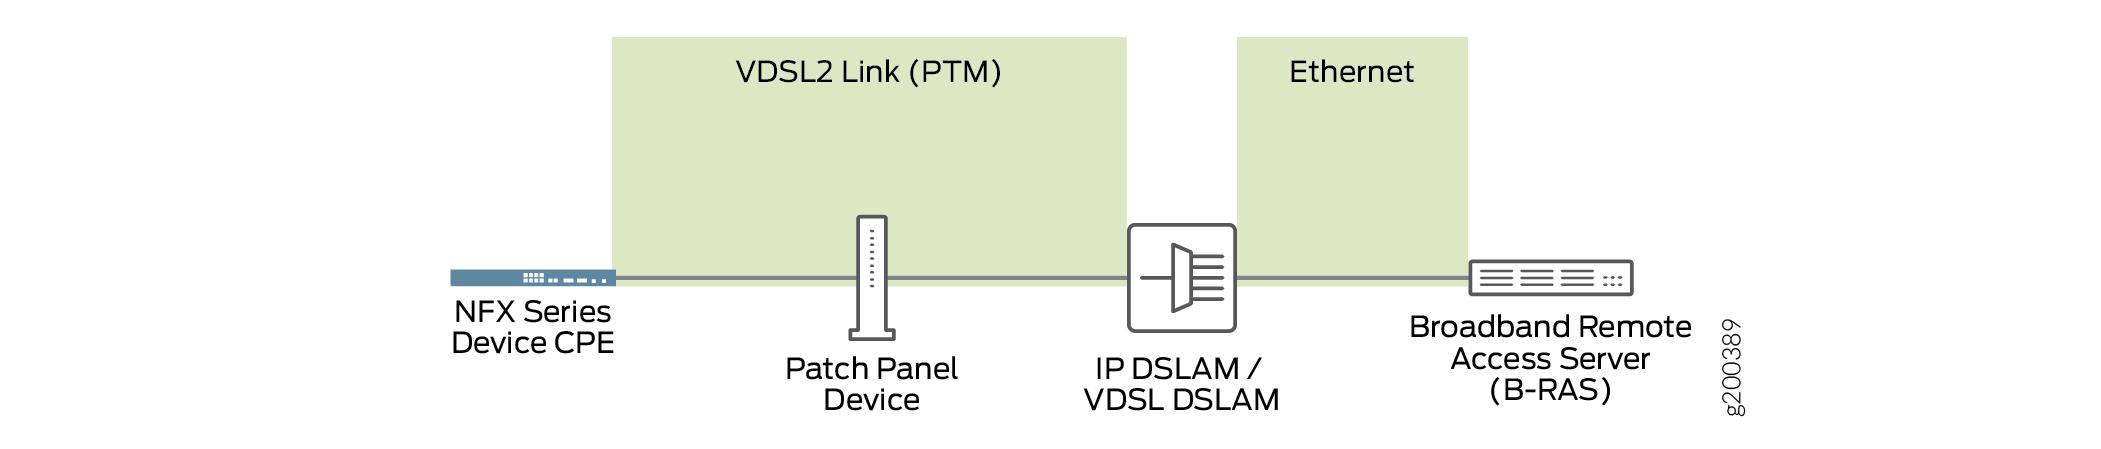 VDSL2 Interfaces on NFX250 Devices - TechLibrary - Juniper NetworksJuniper Networks